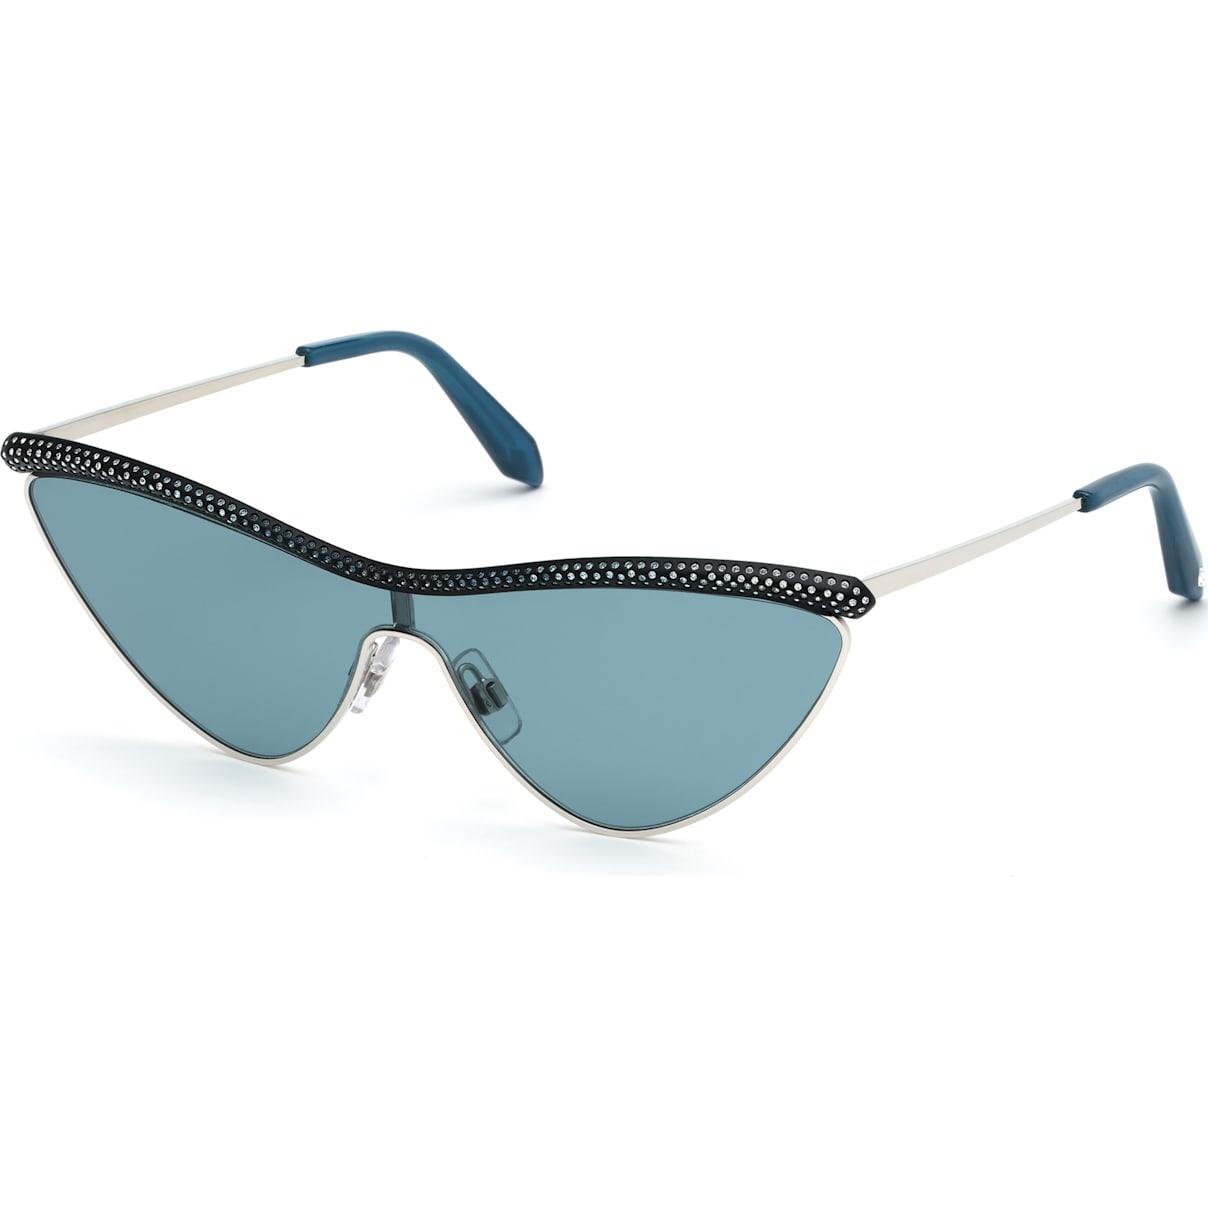 Swarovski Atelier Swarovski Sunglasses, SK239-P 16W, Blue